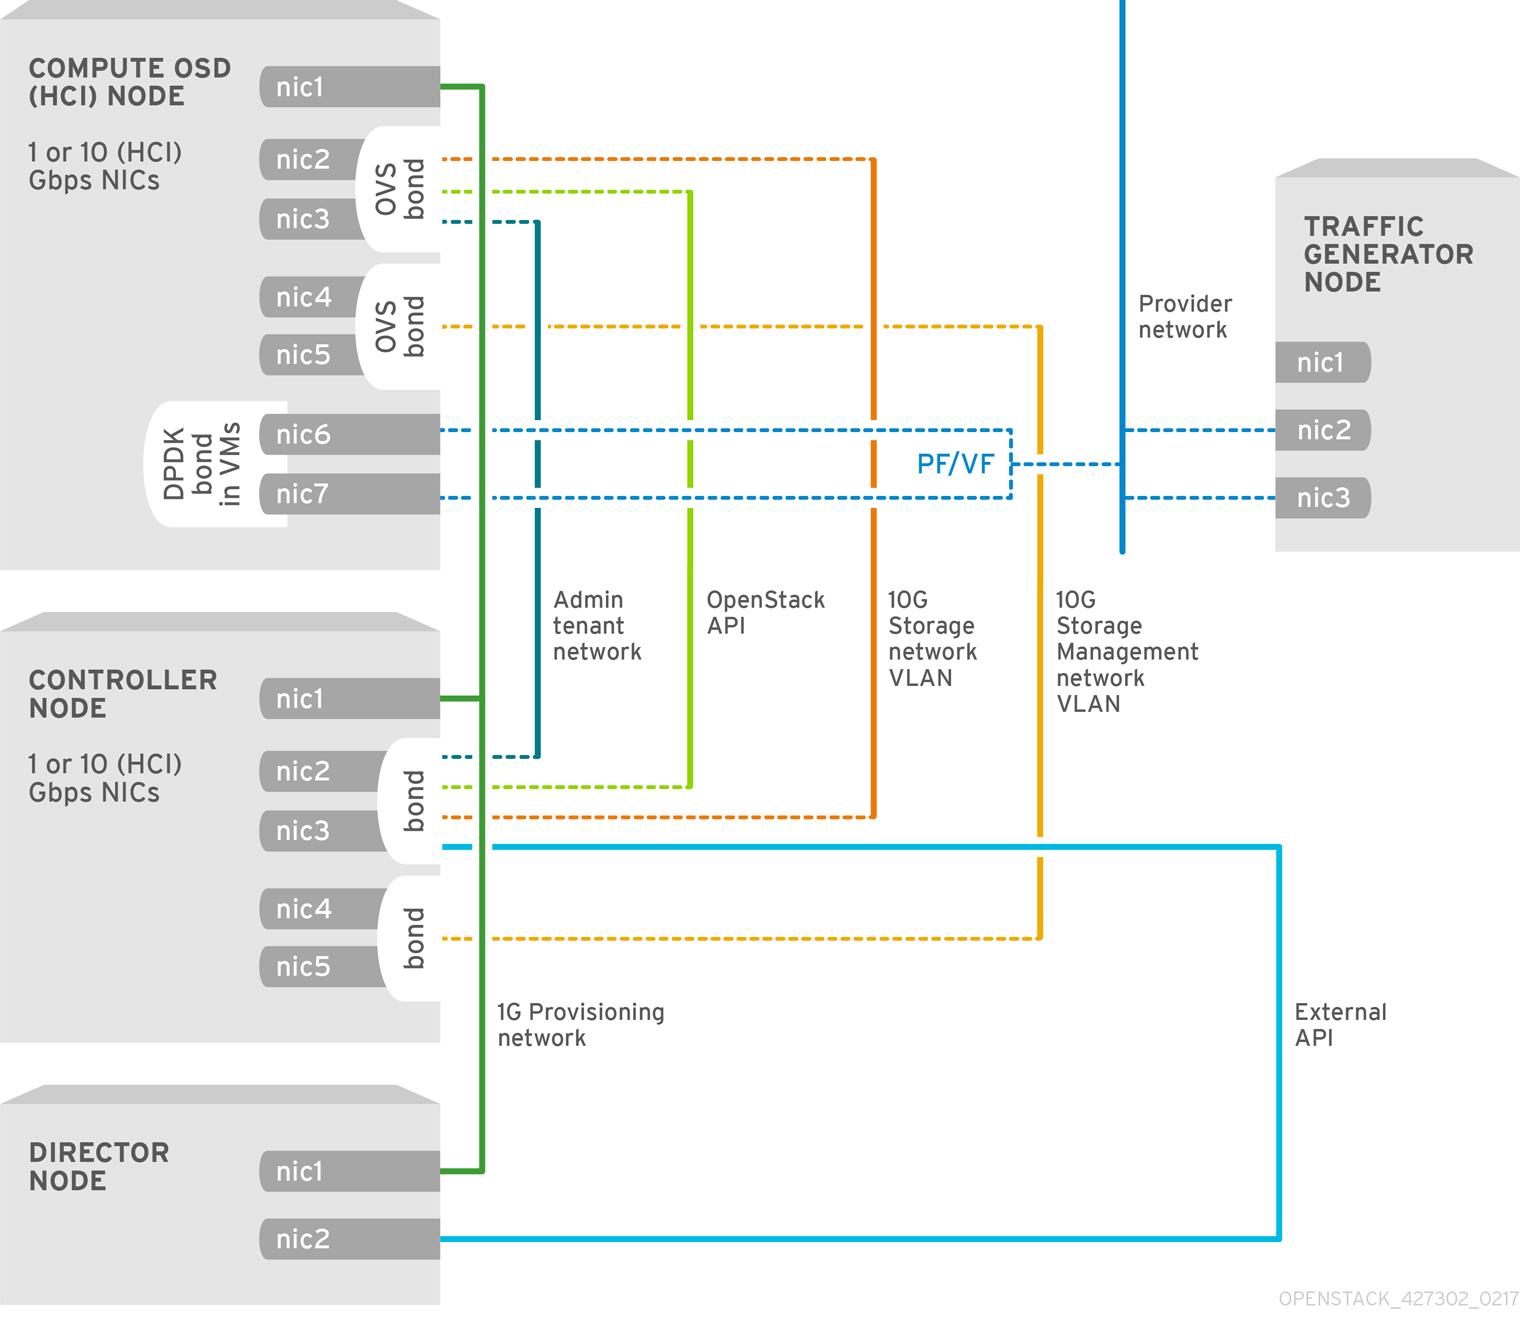 NFV SR-IOV Topology with HCI